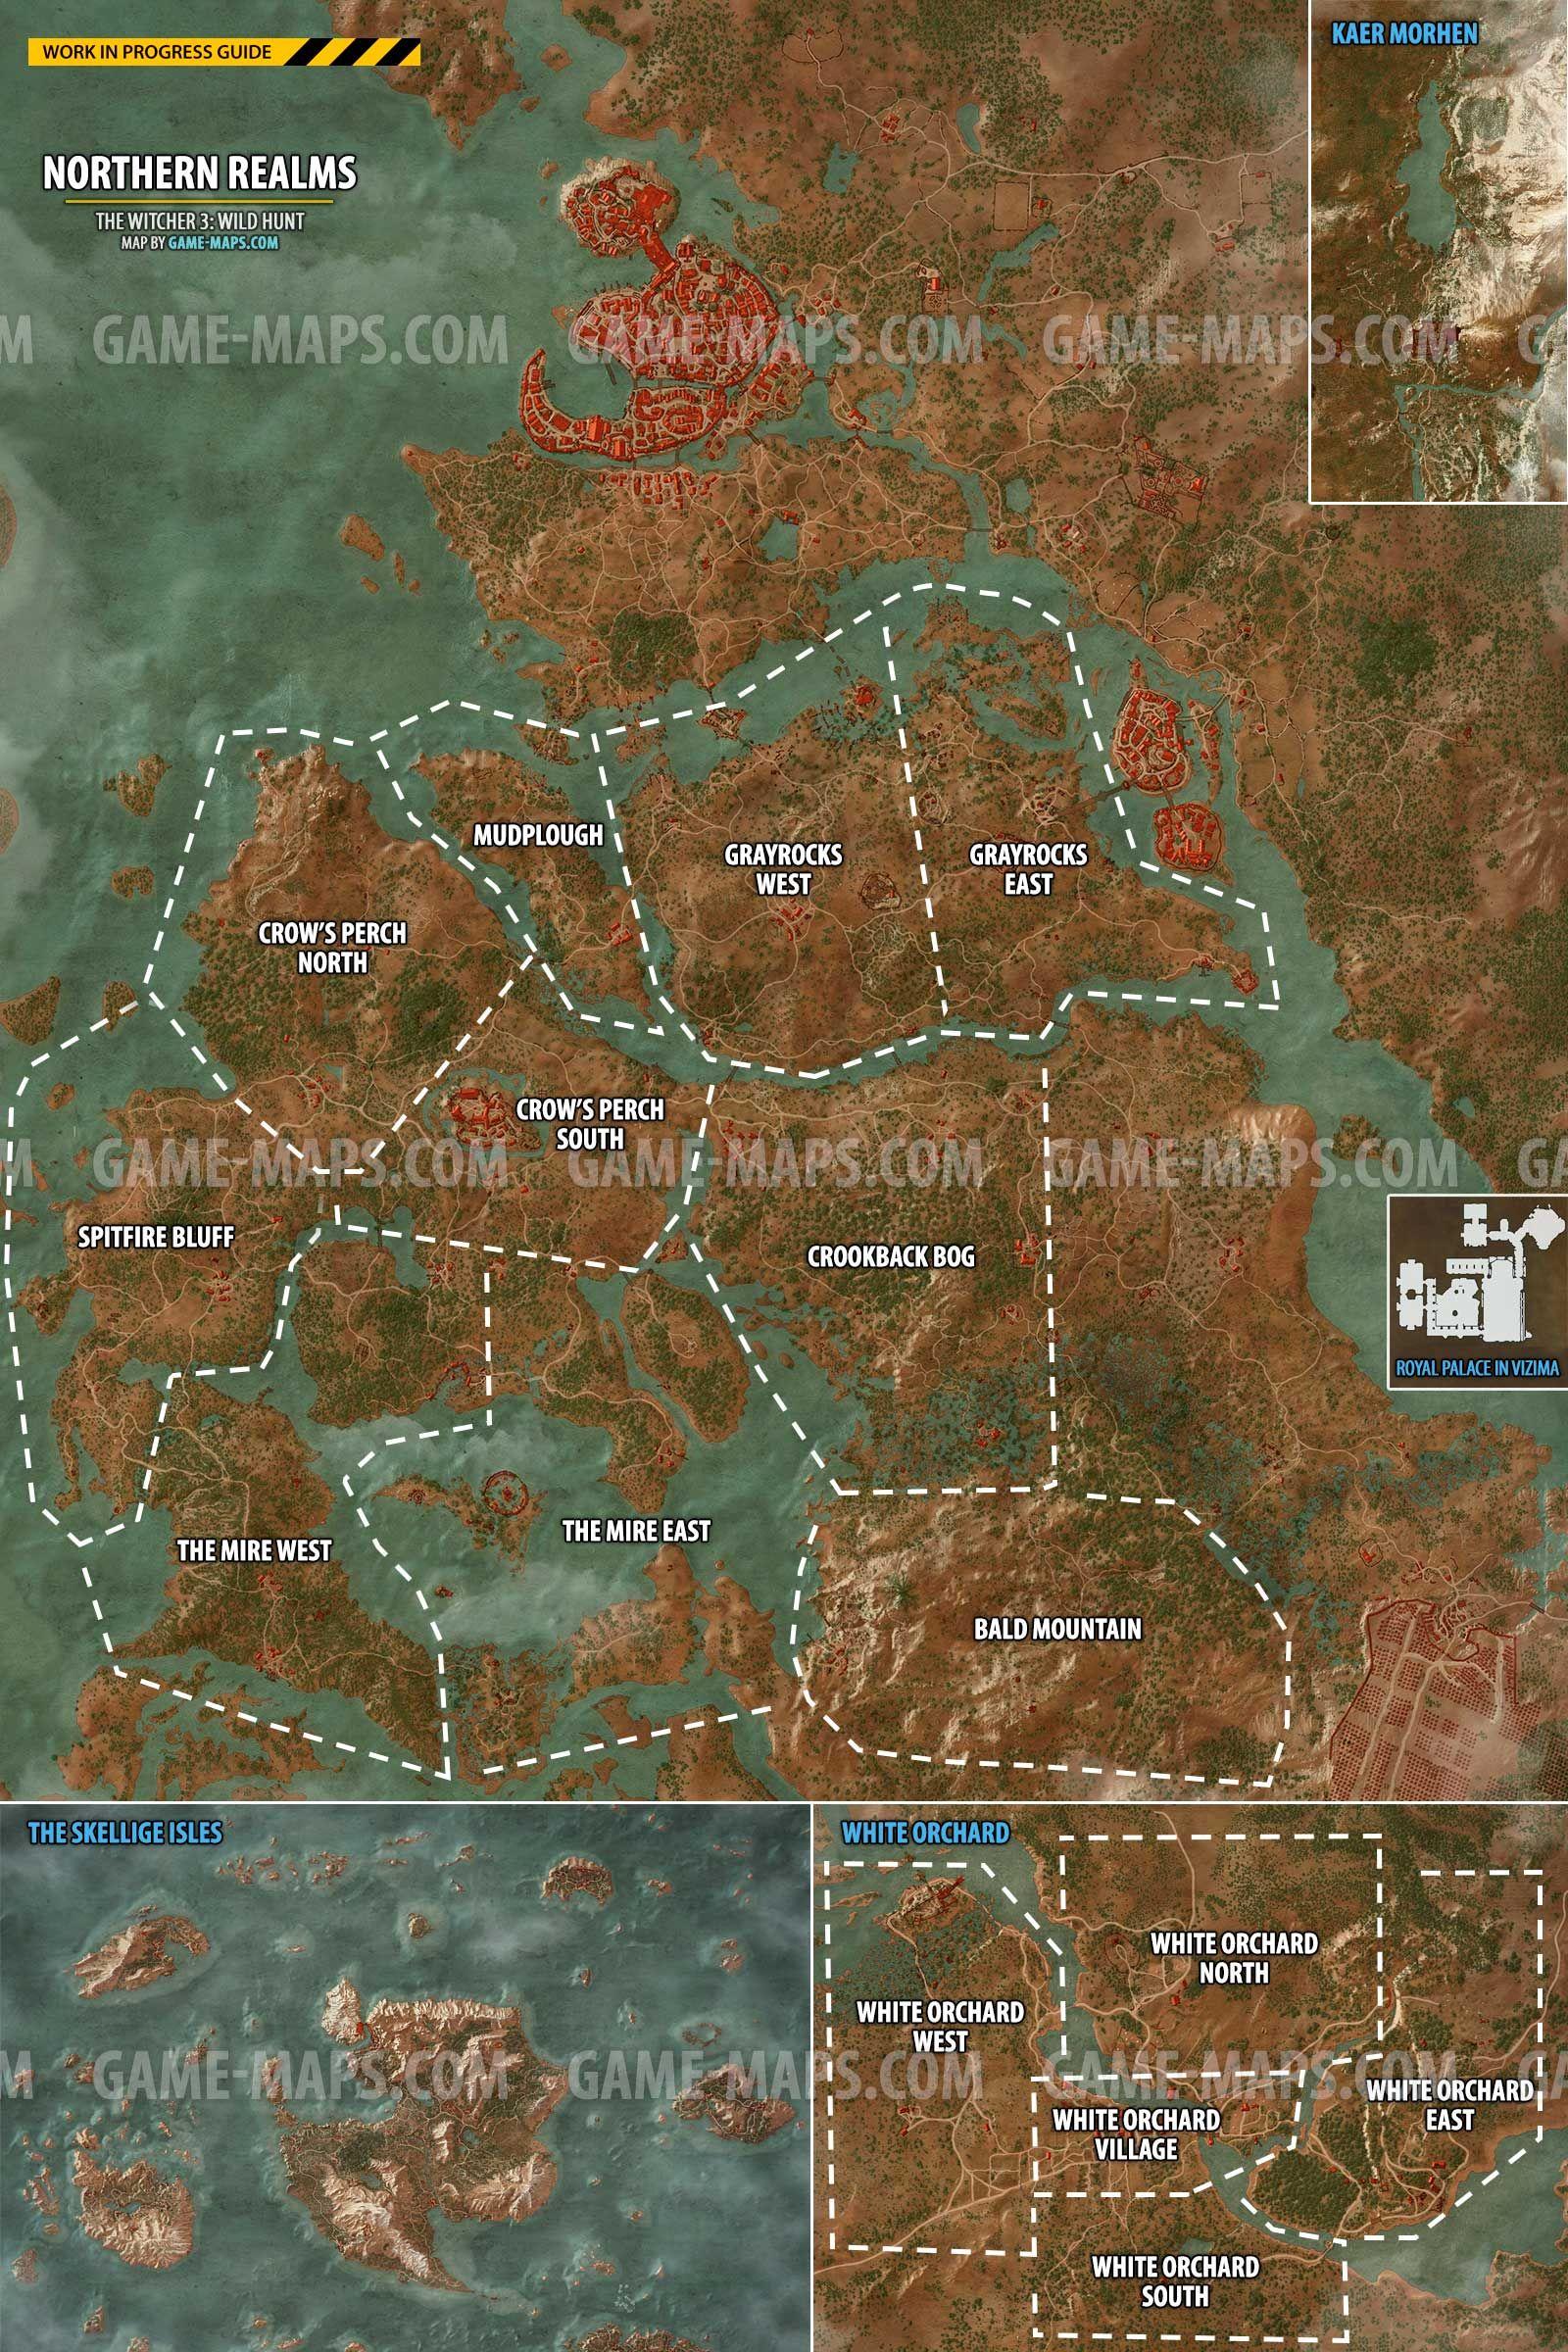 White Orchard Map : white, orchard, Witcher, World, White, Orchard,, Novigrad, (City),, Velen, Man's, Land,, Skellige, Isles,, Royal, Palace, Vi…, Velen,, Fantasy